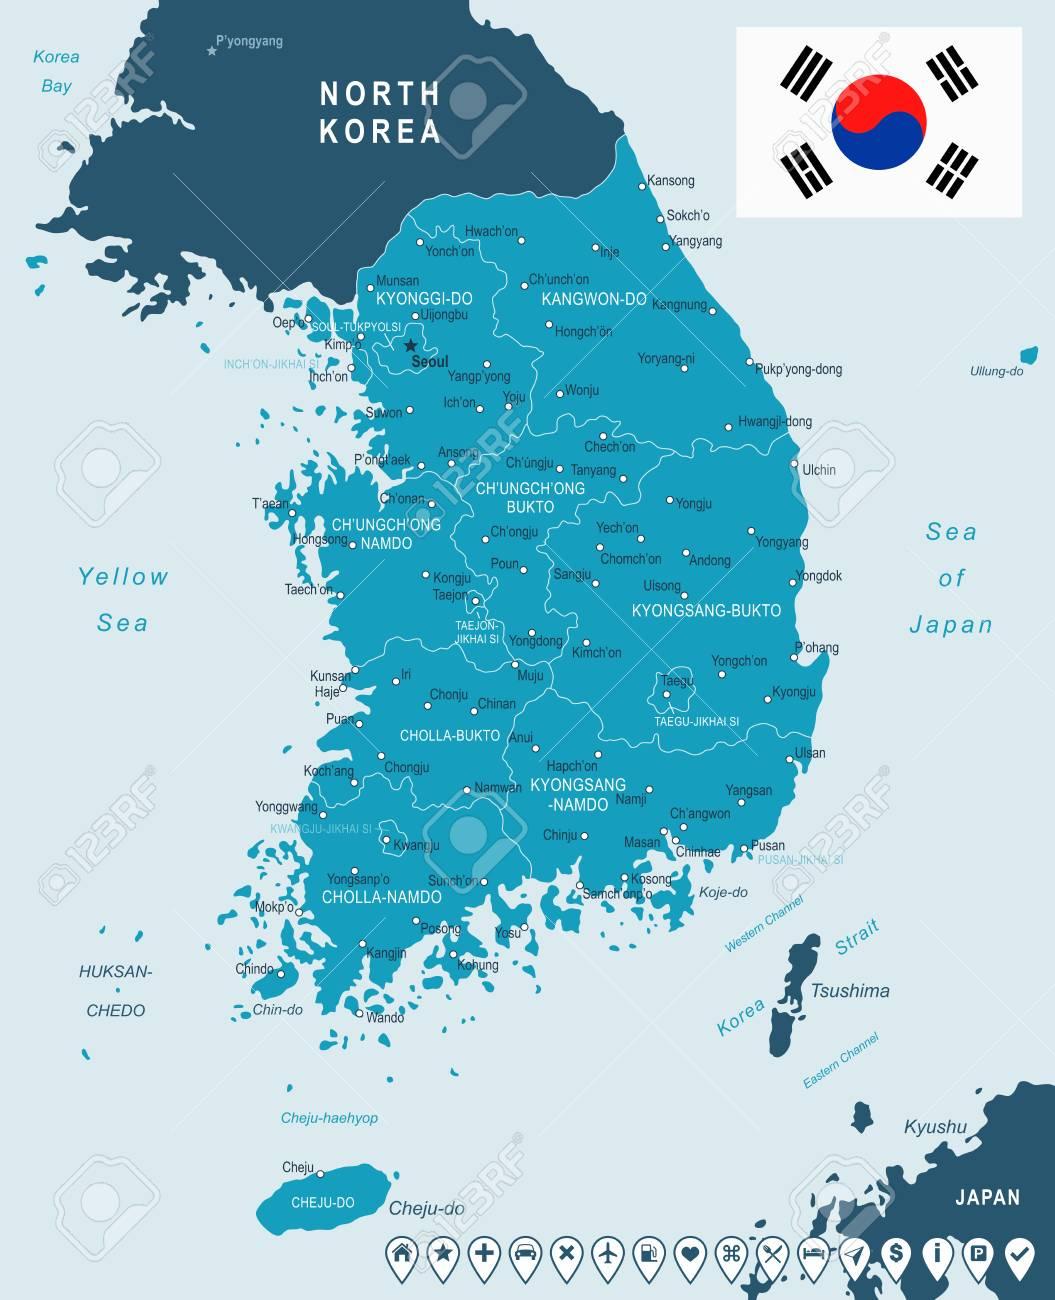 South Korea map and flag - highly detailed vector illustration on mekong river map, grand canal map, luzon strait map, monaco bay map, taklamakan desert map, hangzhou bay, florida bay map, bohai sea, indonesia map, gulf of tonkin map, mongolian plateau map, yellow sea map, mu us desert map, tatar strait map, korea water park, south bay map, korean empire map, bo hai map, mexico bay map, yellow sea, pacific ocean map, yalu river, the aquariums of pyongyang, goryeo map, qinghai lake map, liaodong bay, north pyongan,